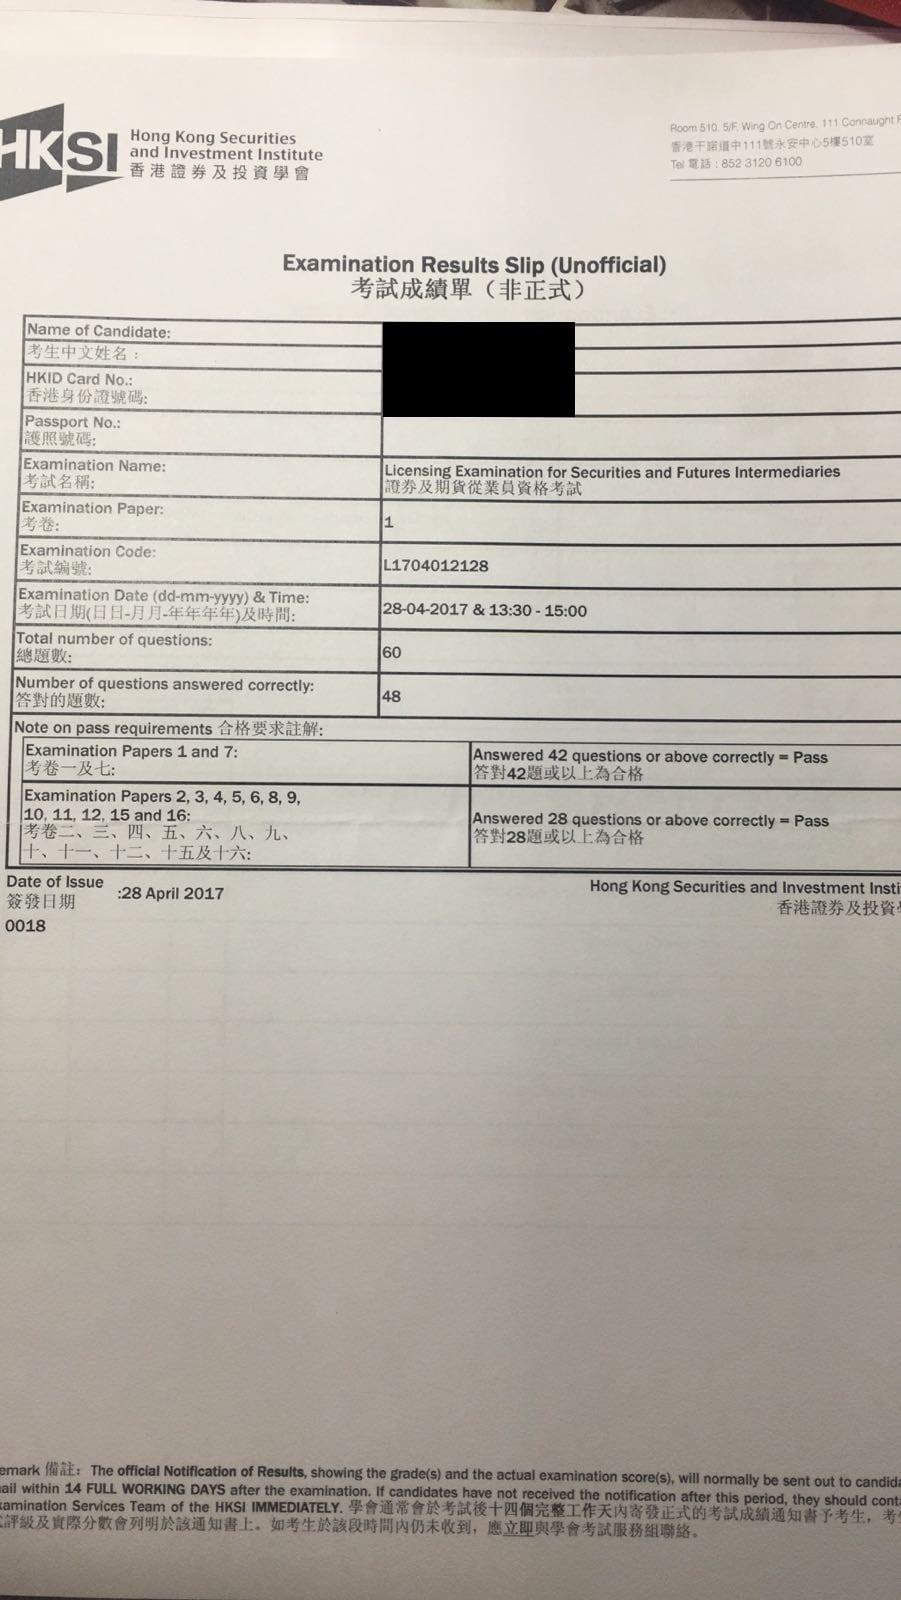 ZMY 28/4/2017 LE Paper 1 證券期貨從業員資格考試卷一 Pass